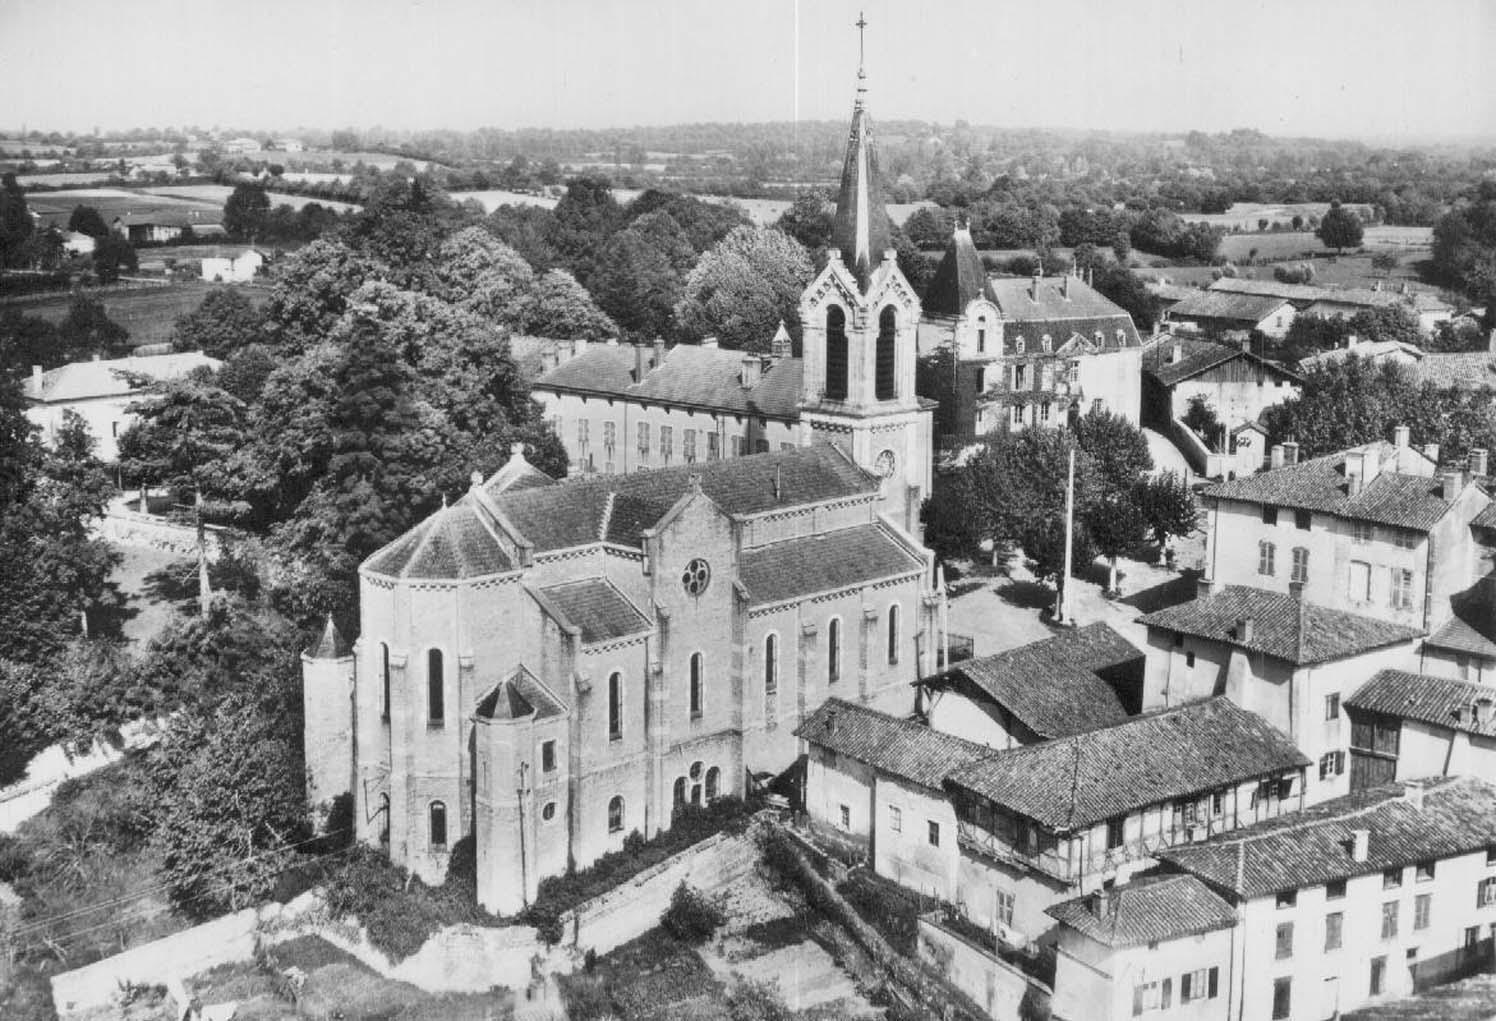 Eglise Saint-Maurice vue aérienne